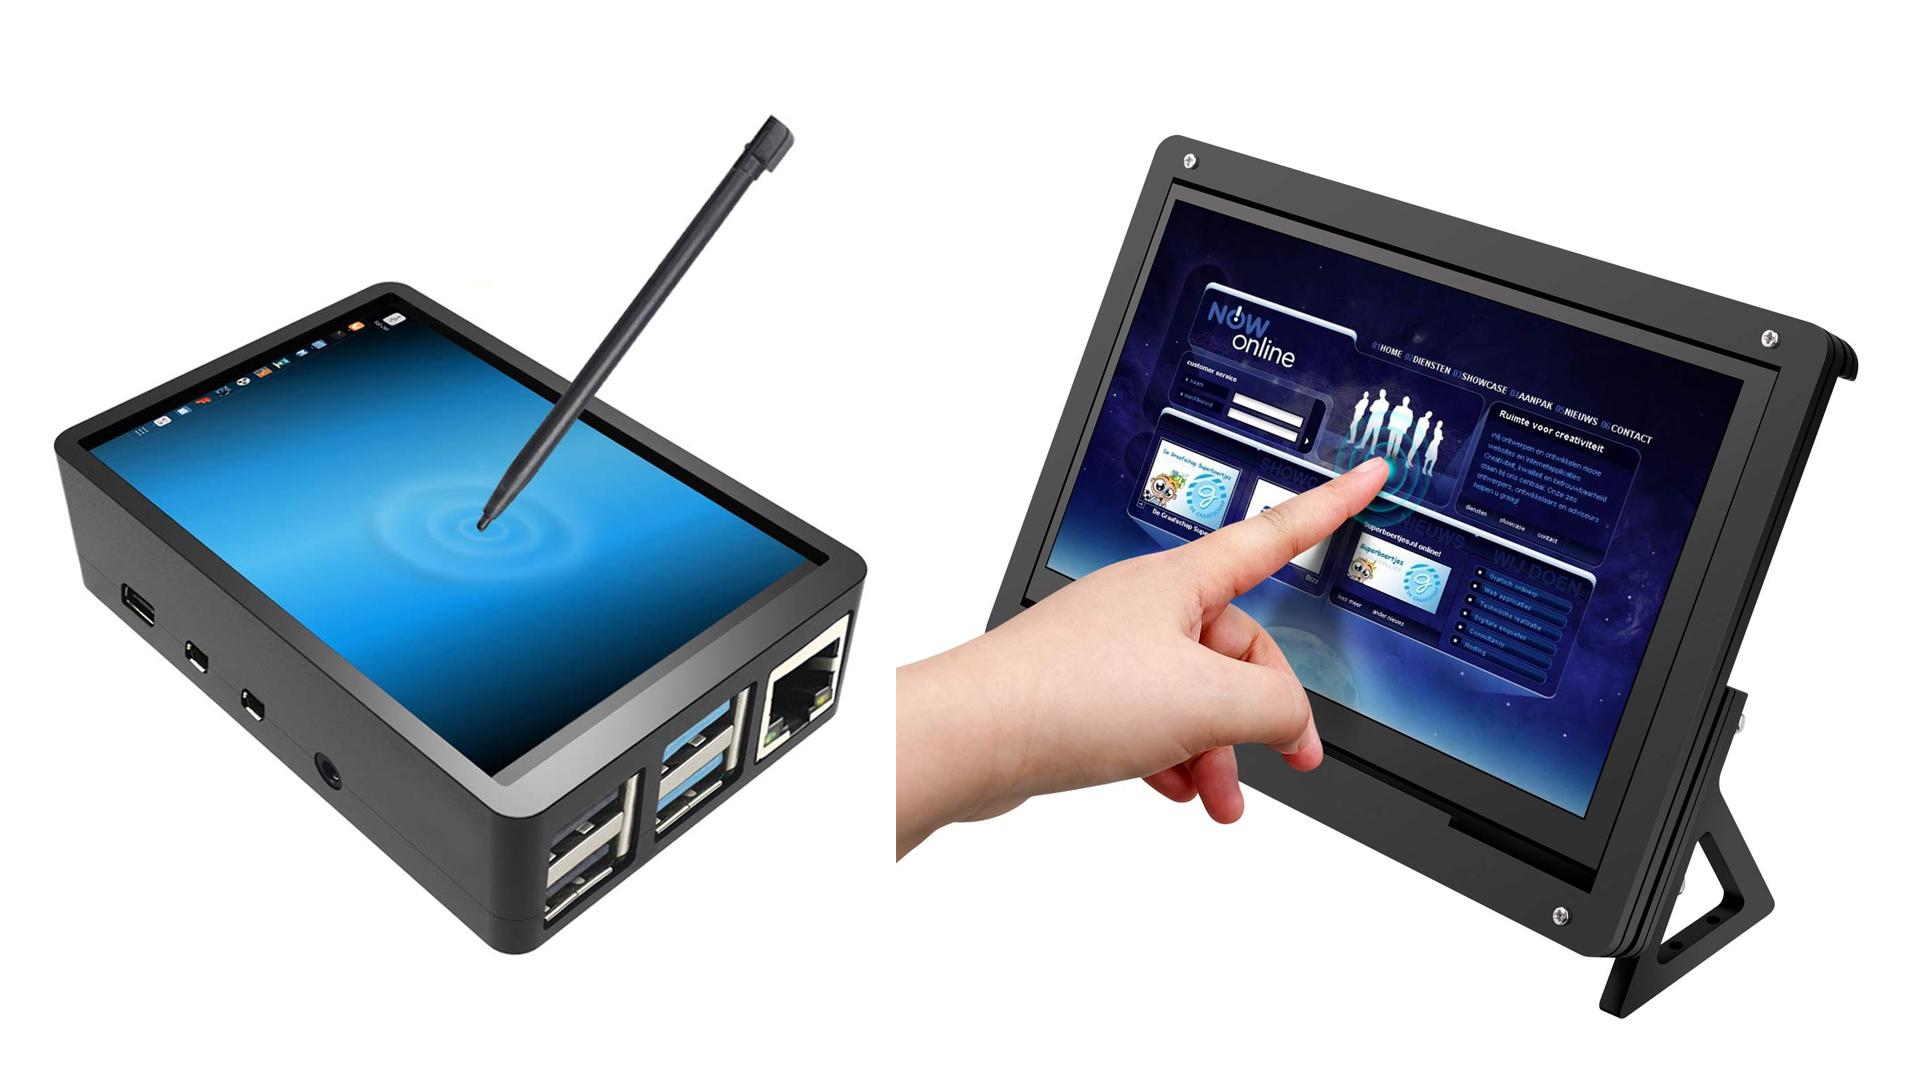 The Longrunner and Jun-Electron touchscreen Pi cases